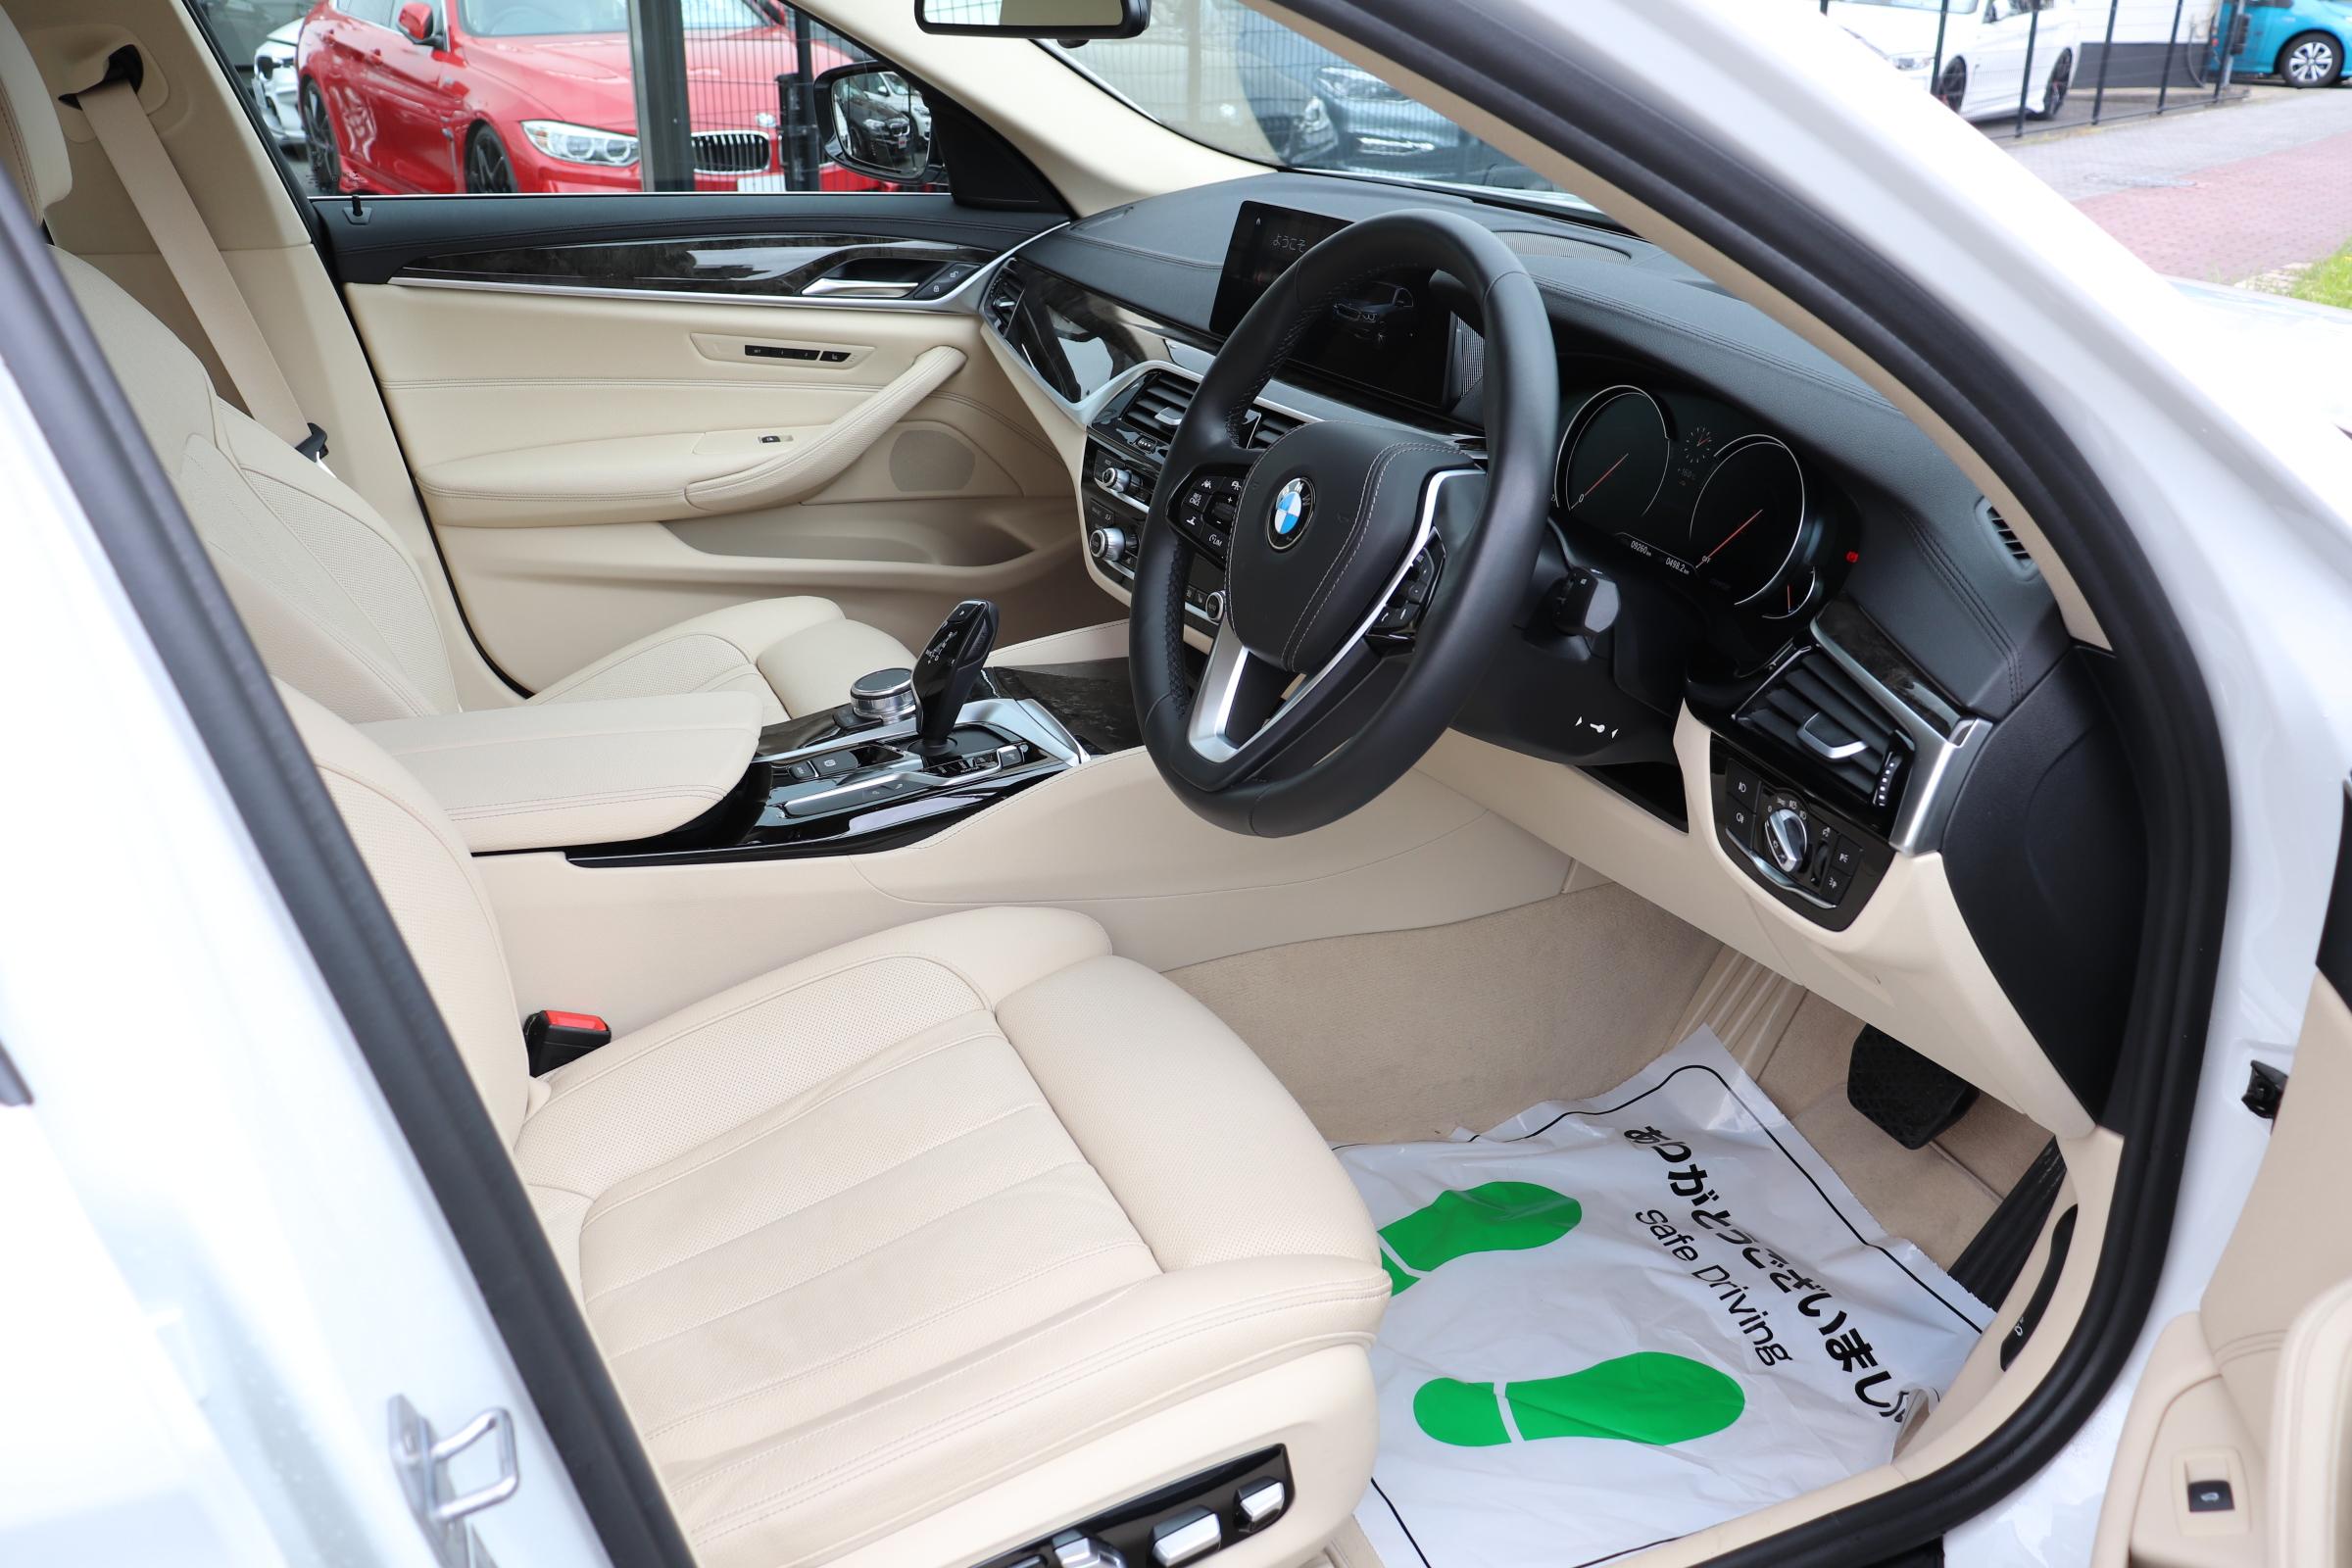 540i ラグジュアリー コンフォート&イノベーションP ワンオナ HUD Sクローズドア ジェスチャー ディスプレイK車両画像11